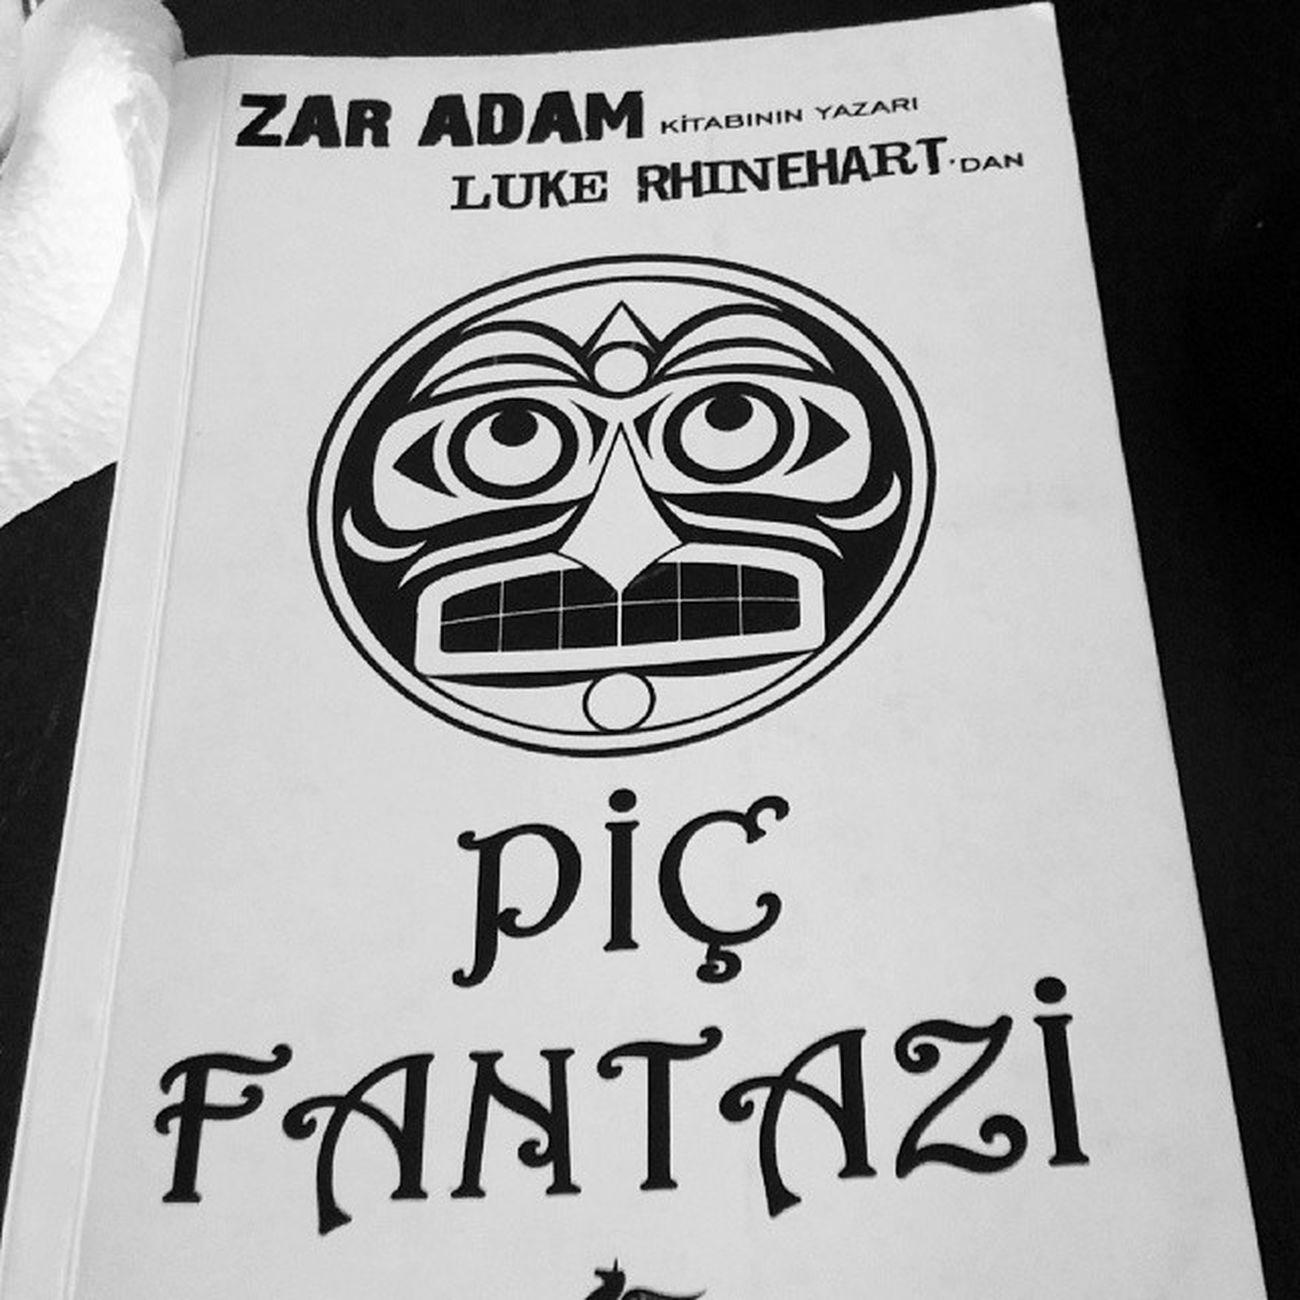 Okuduğum en güzel kitaplardan Picfantazi Lukerhinehart Pegasus Kitap Book Zaradam Montauk